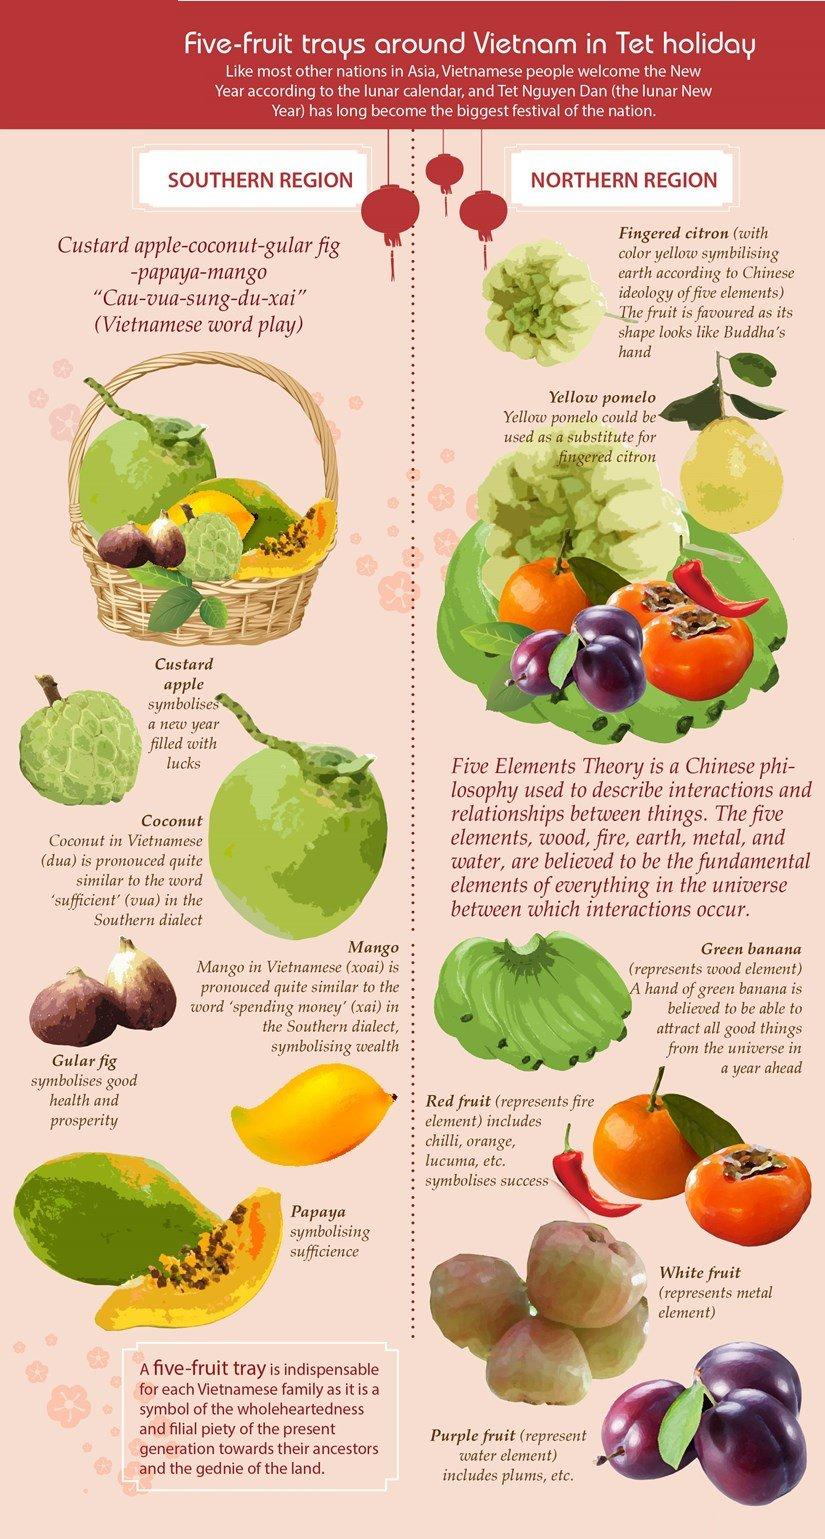 Five-fruit trays around Vietnam in Tet holiday. Source: VNA